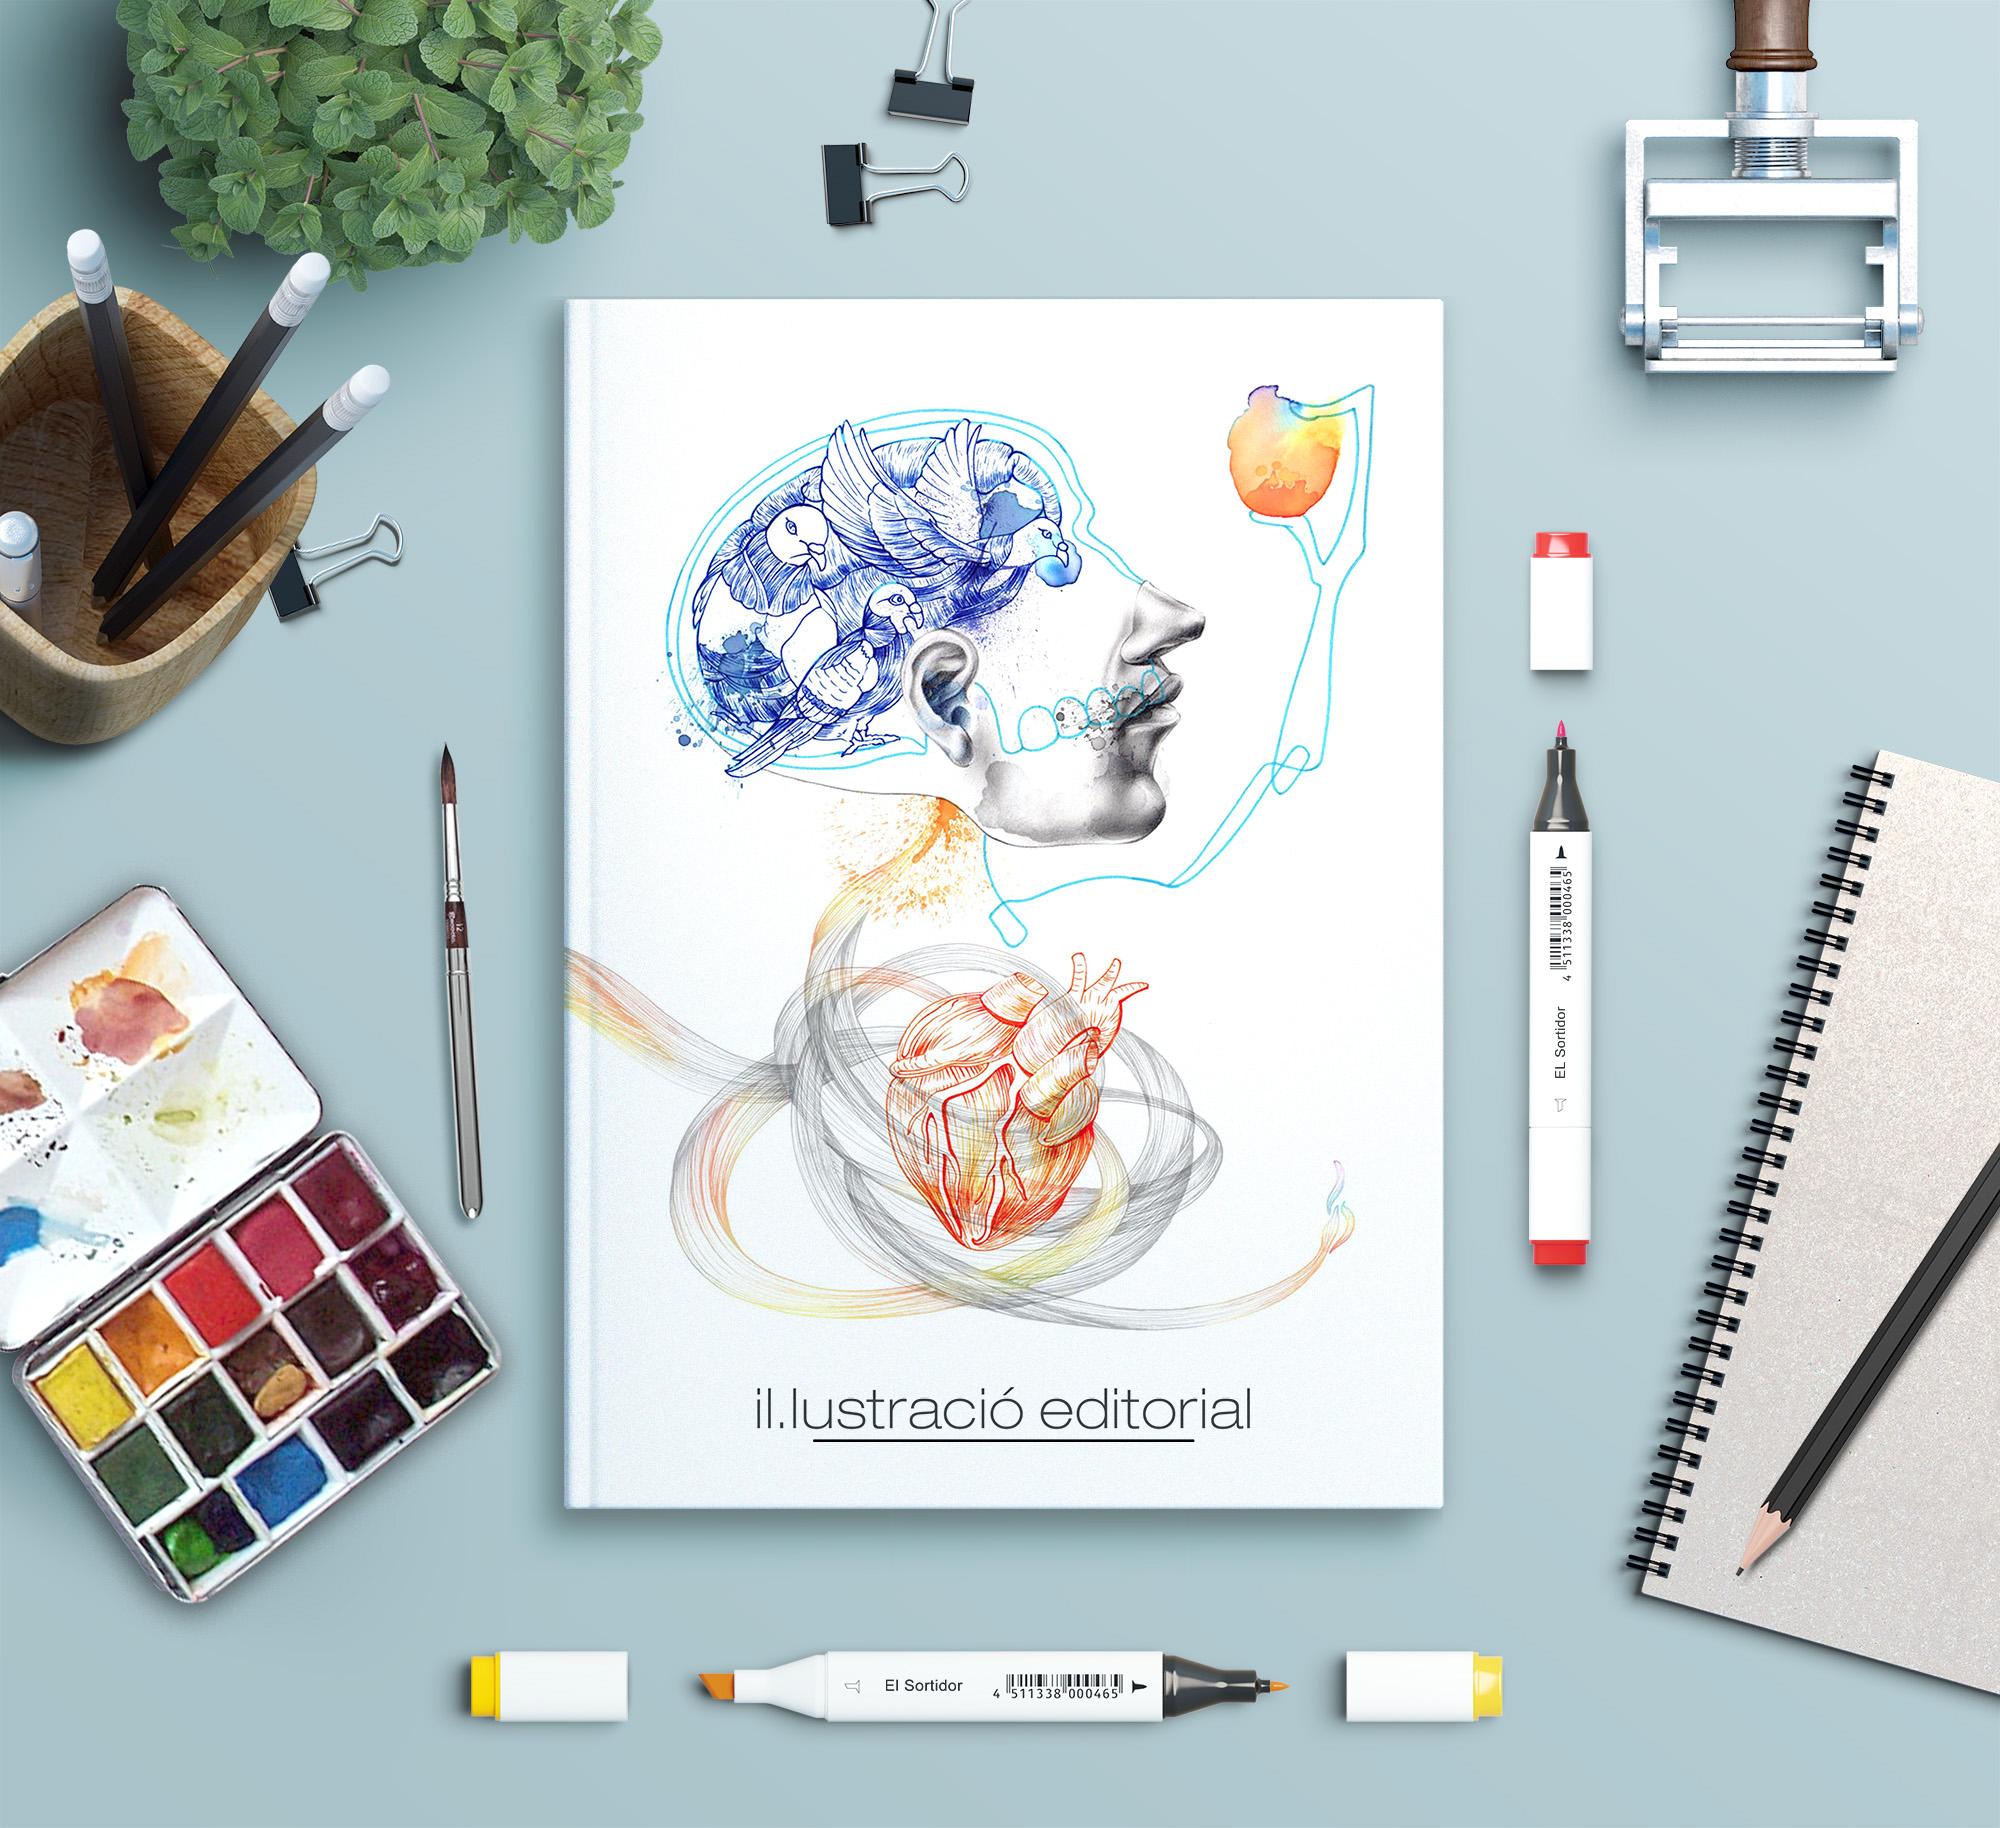 taller de ilustracion El Sortidor Giselle Vitali